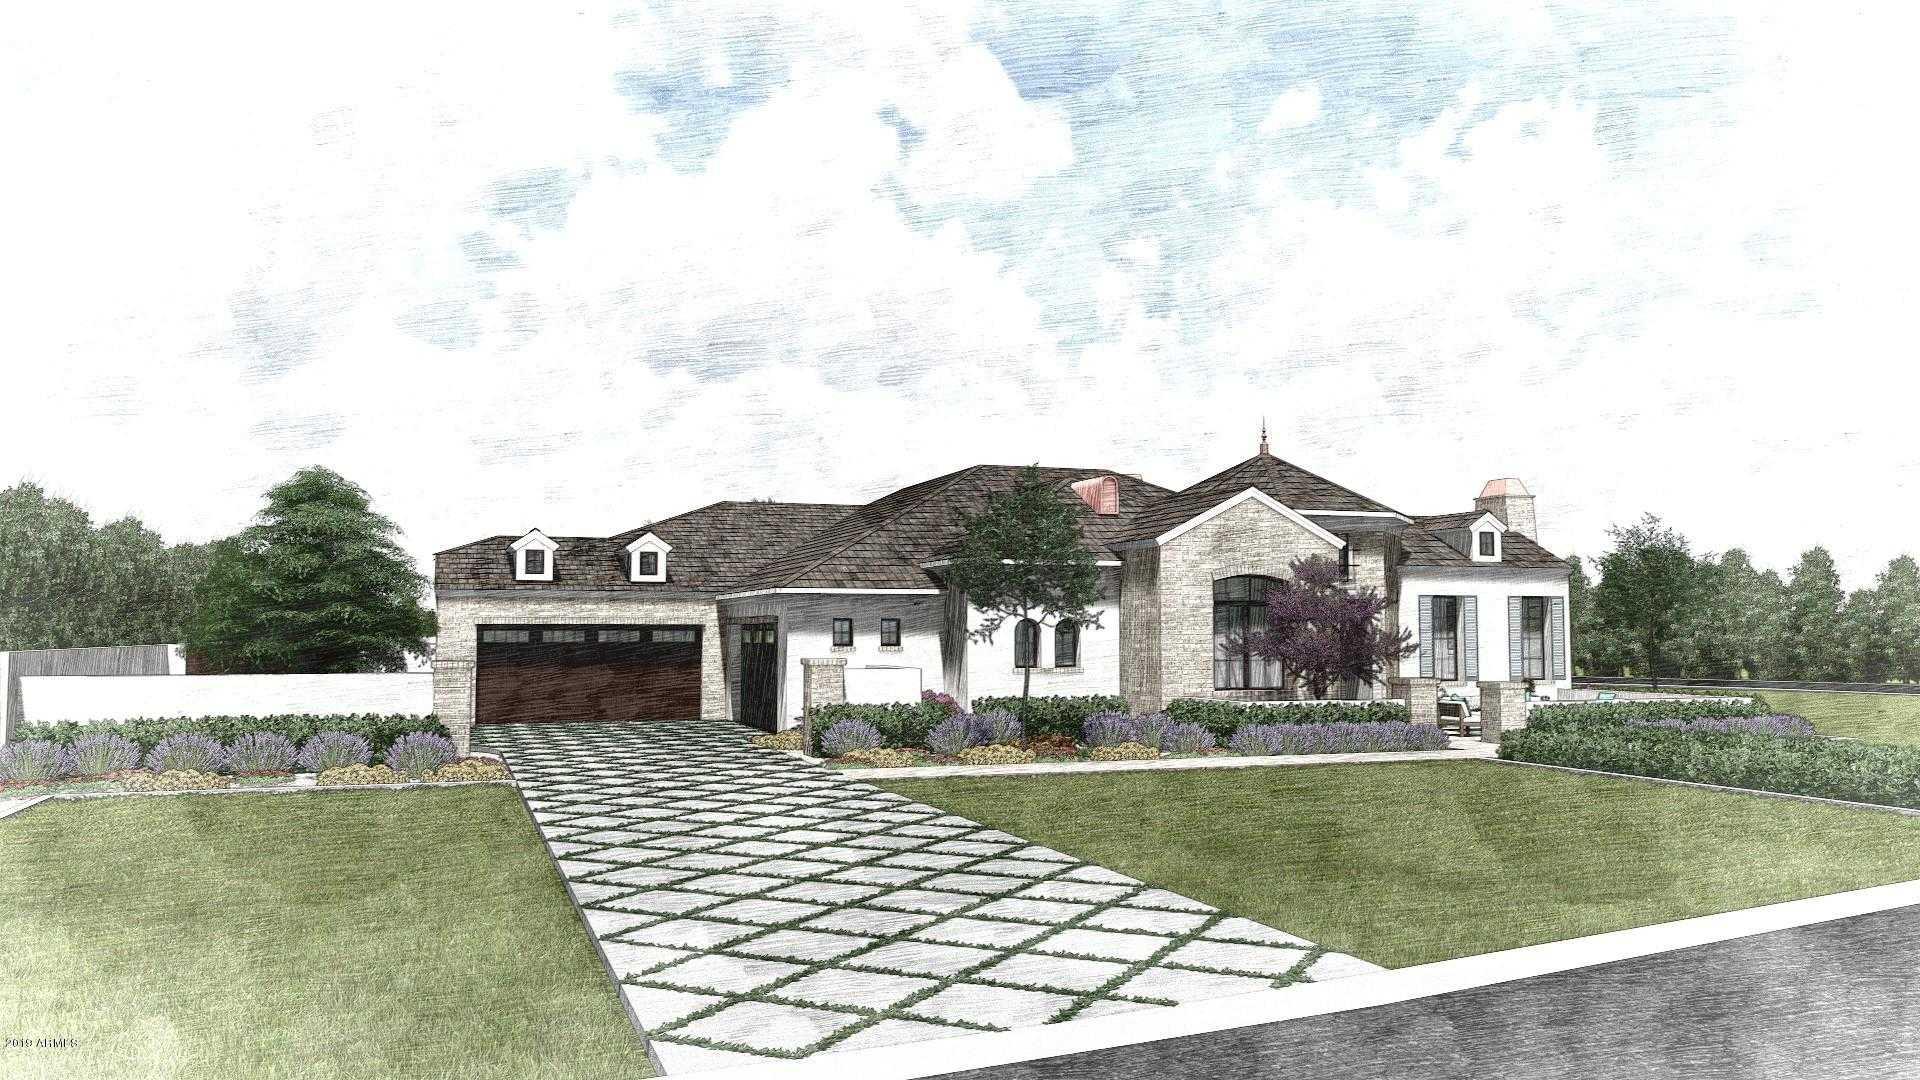 $4,450,000 - 5Br/7Ba - Home for Sale in Casa Blanca Estates Lot 20-37 & Tr A, Paradise Valley